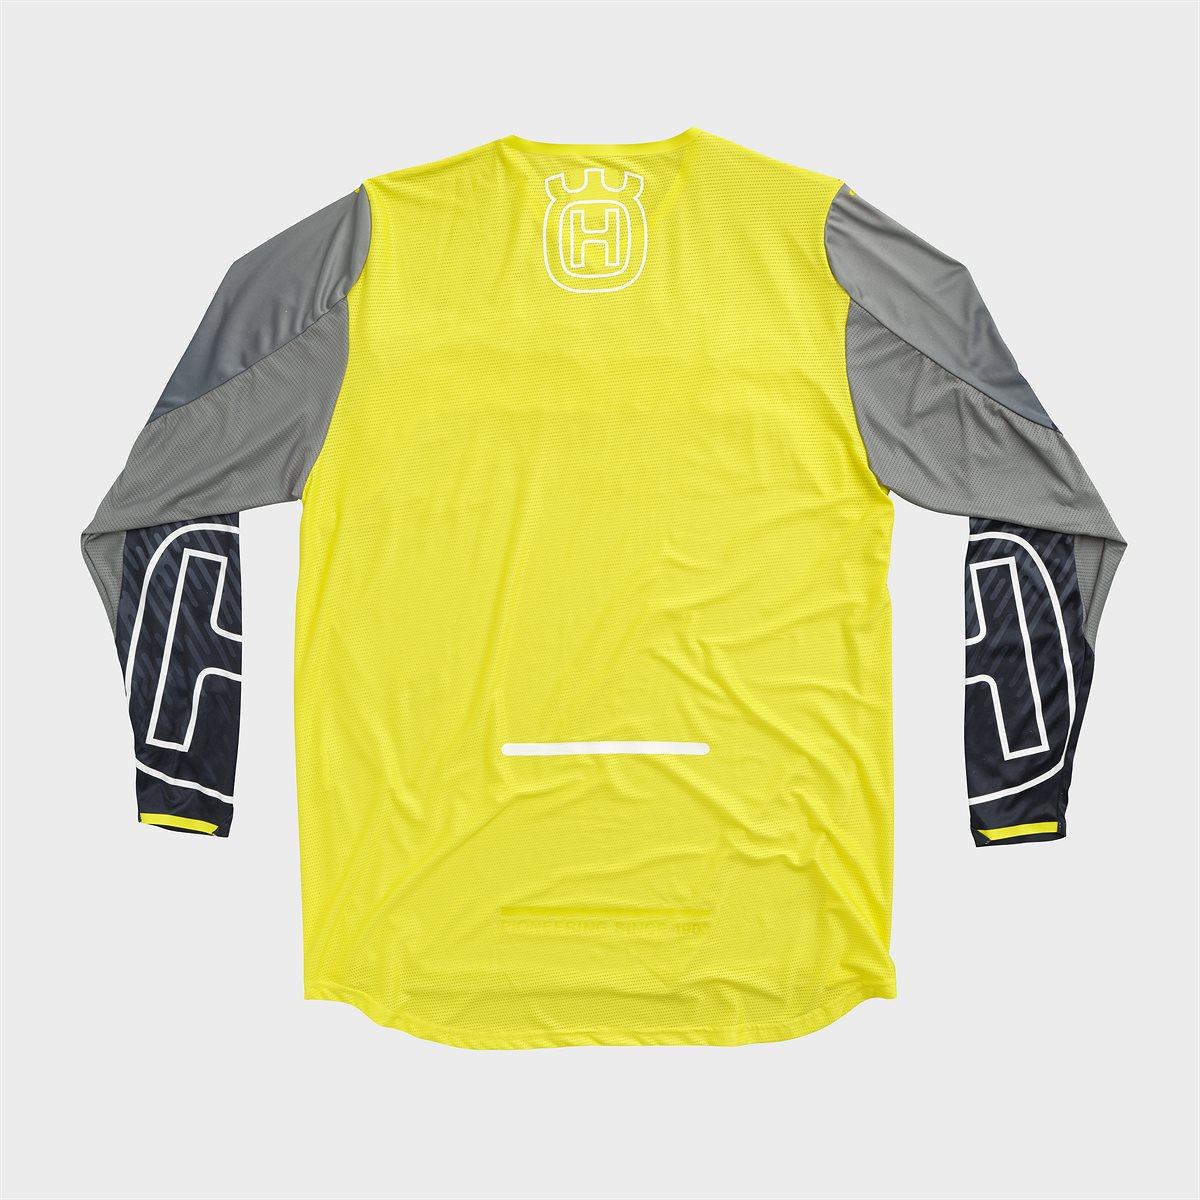 Railed Shirt Pro (3)